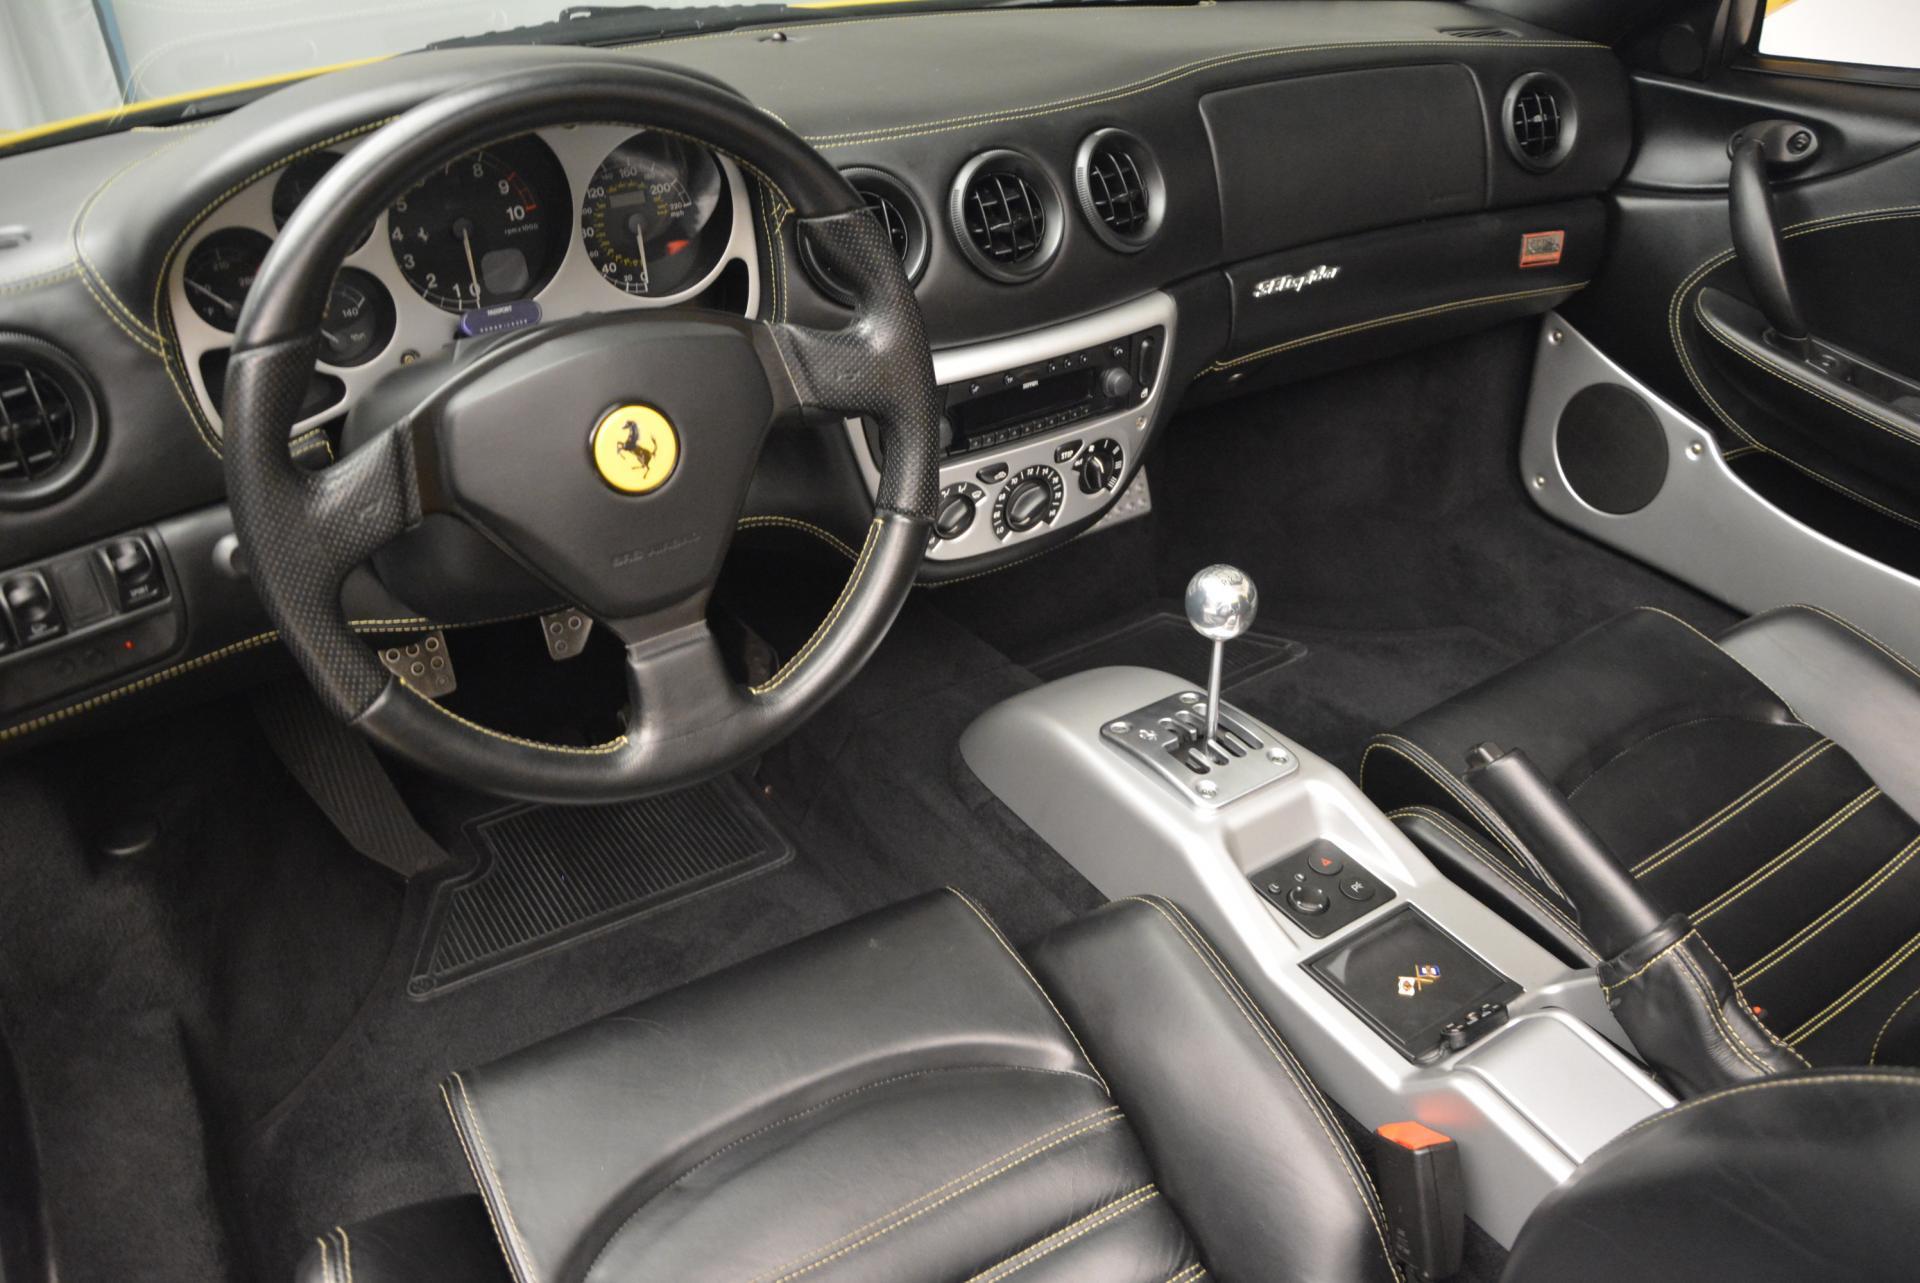 Used 2003 Ferrari 360 Spider 6-Speed Manual  For Sale In Westport, CT 127_p25